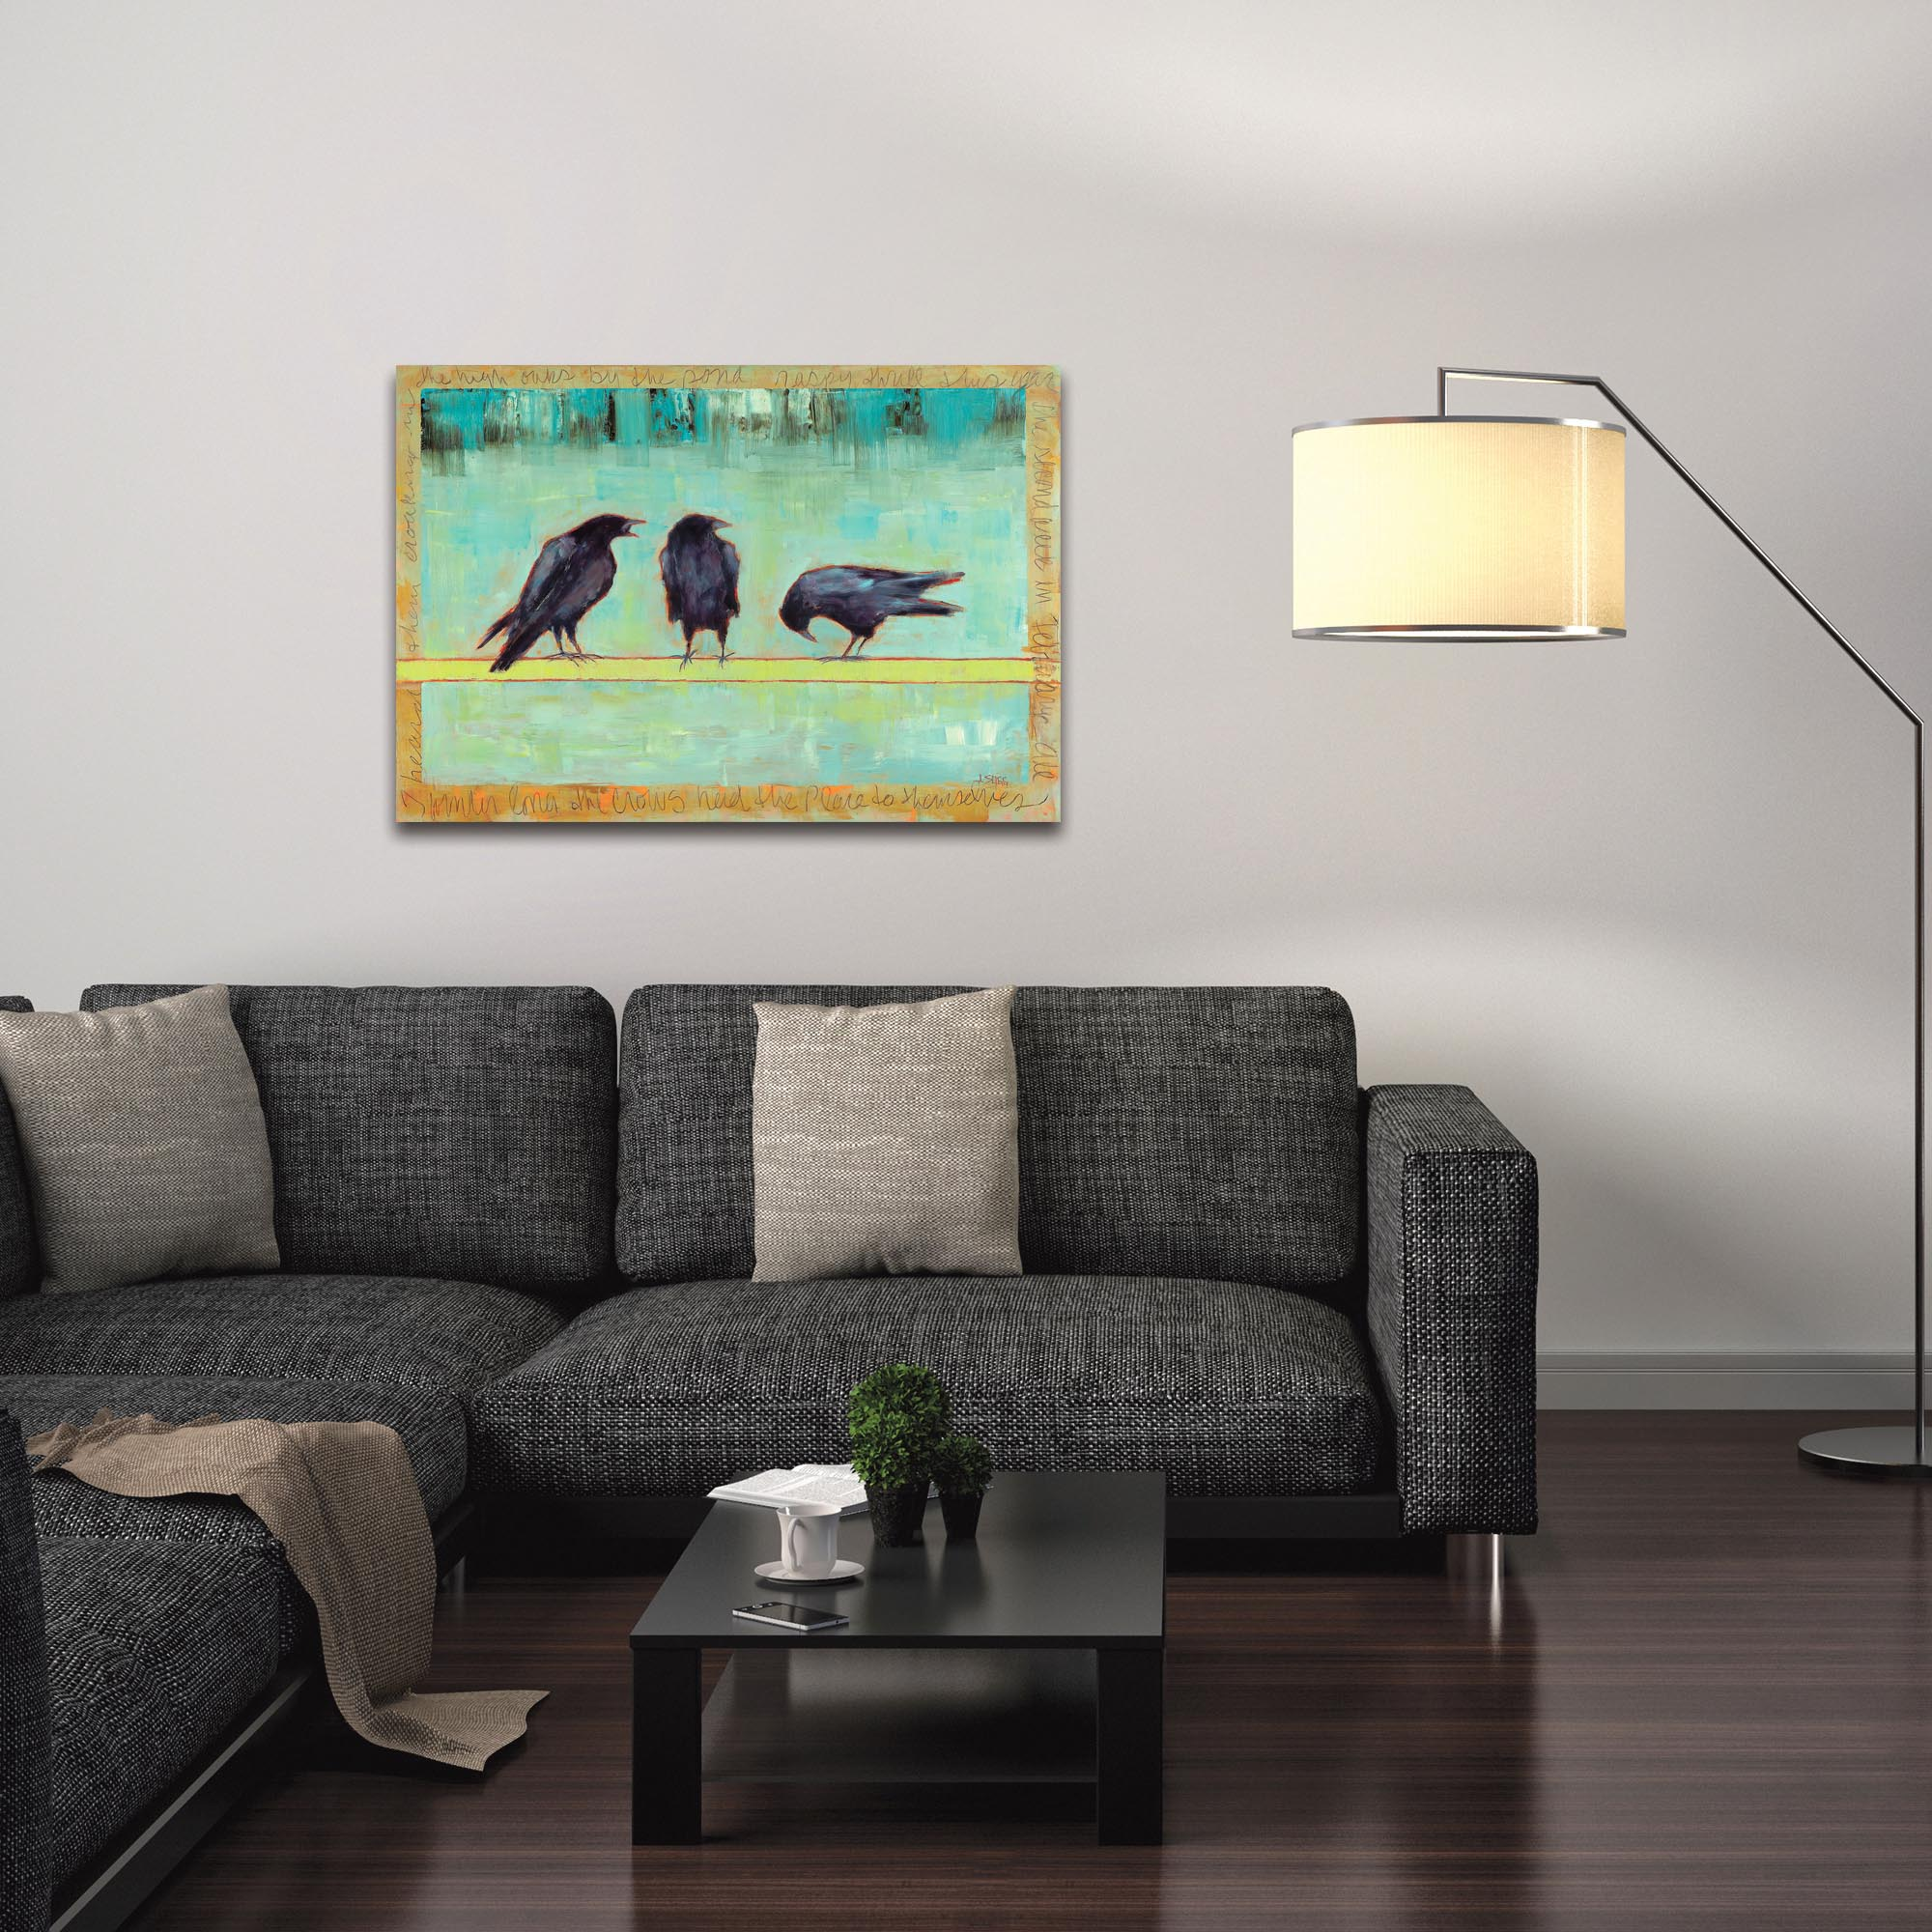 Contemporary Wall Art 'Crow Bar 1' - Urban Birds Decor on Metal or Plexiglass - Lifestyle View